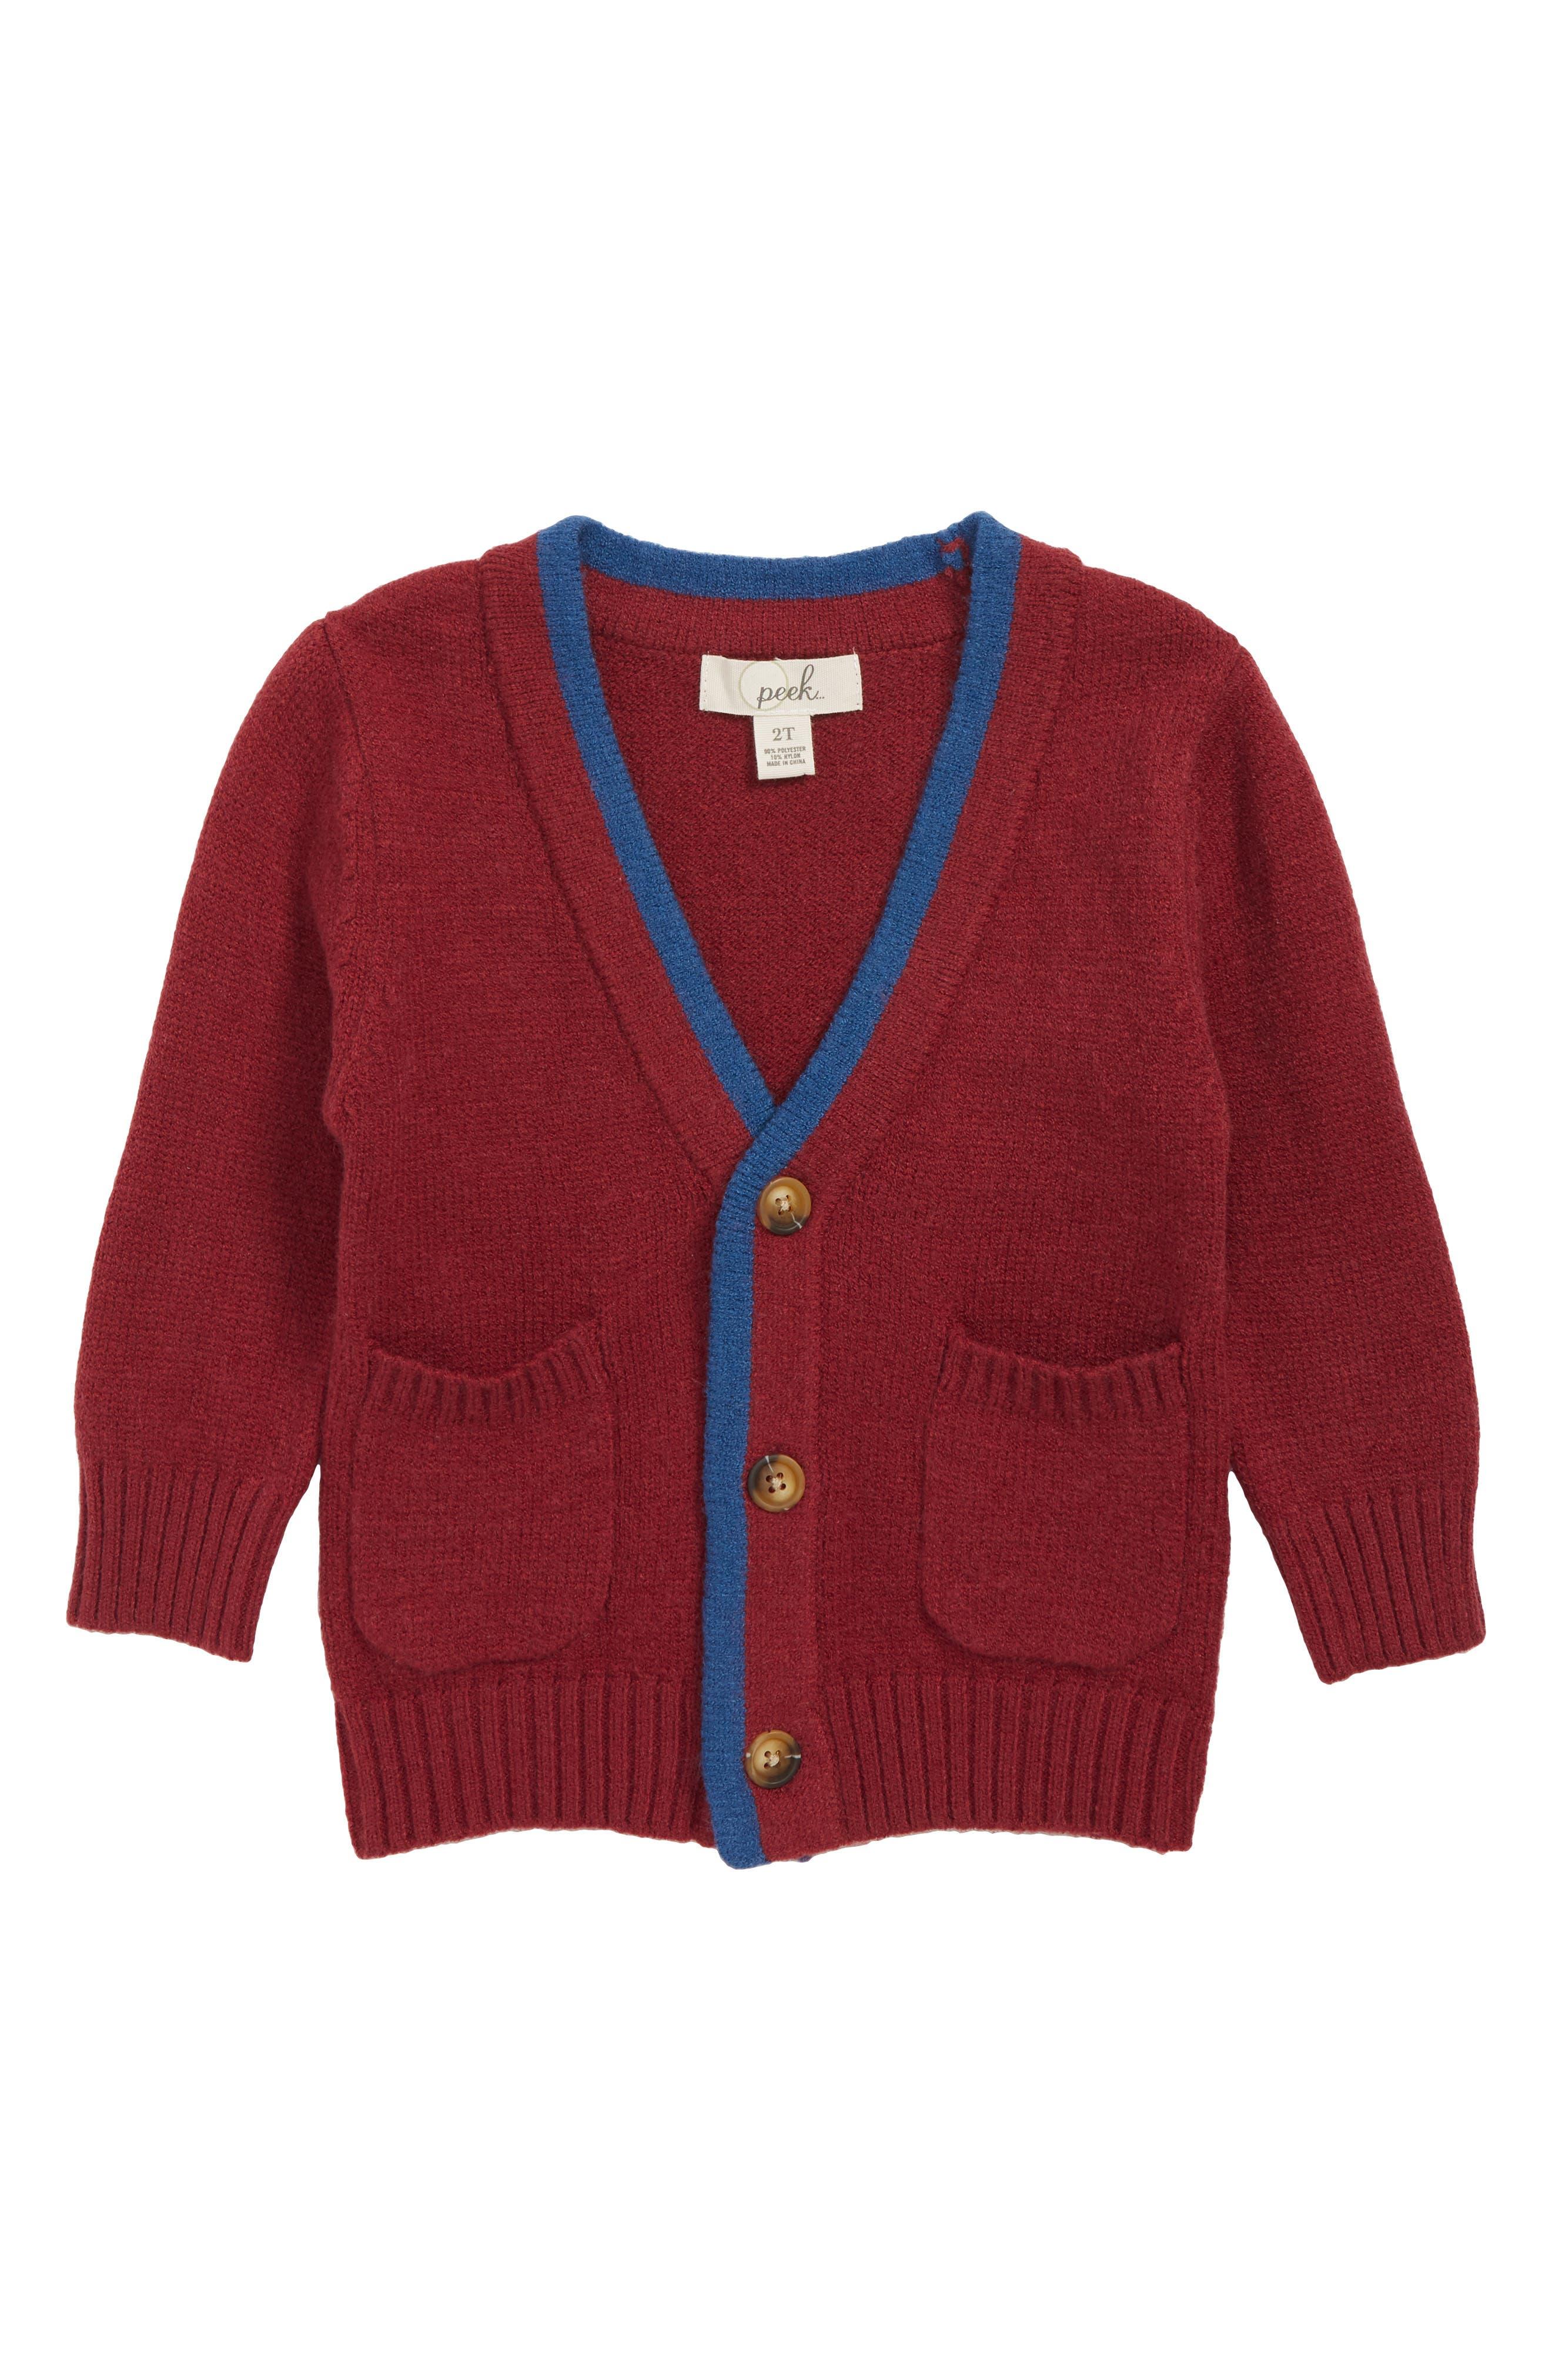 Vintage Style Children's Clothing: Girls, Boys, Baby, Toddler Toddler Boys Peek Preston Cardigan Size 2T - Burgundy $25.20 AT vintagedancer.com